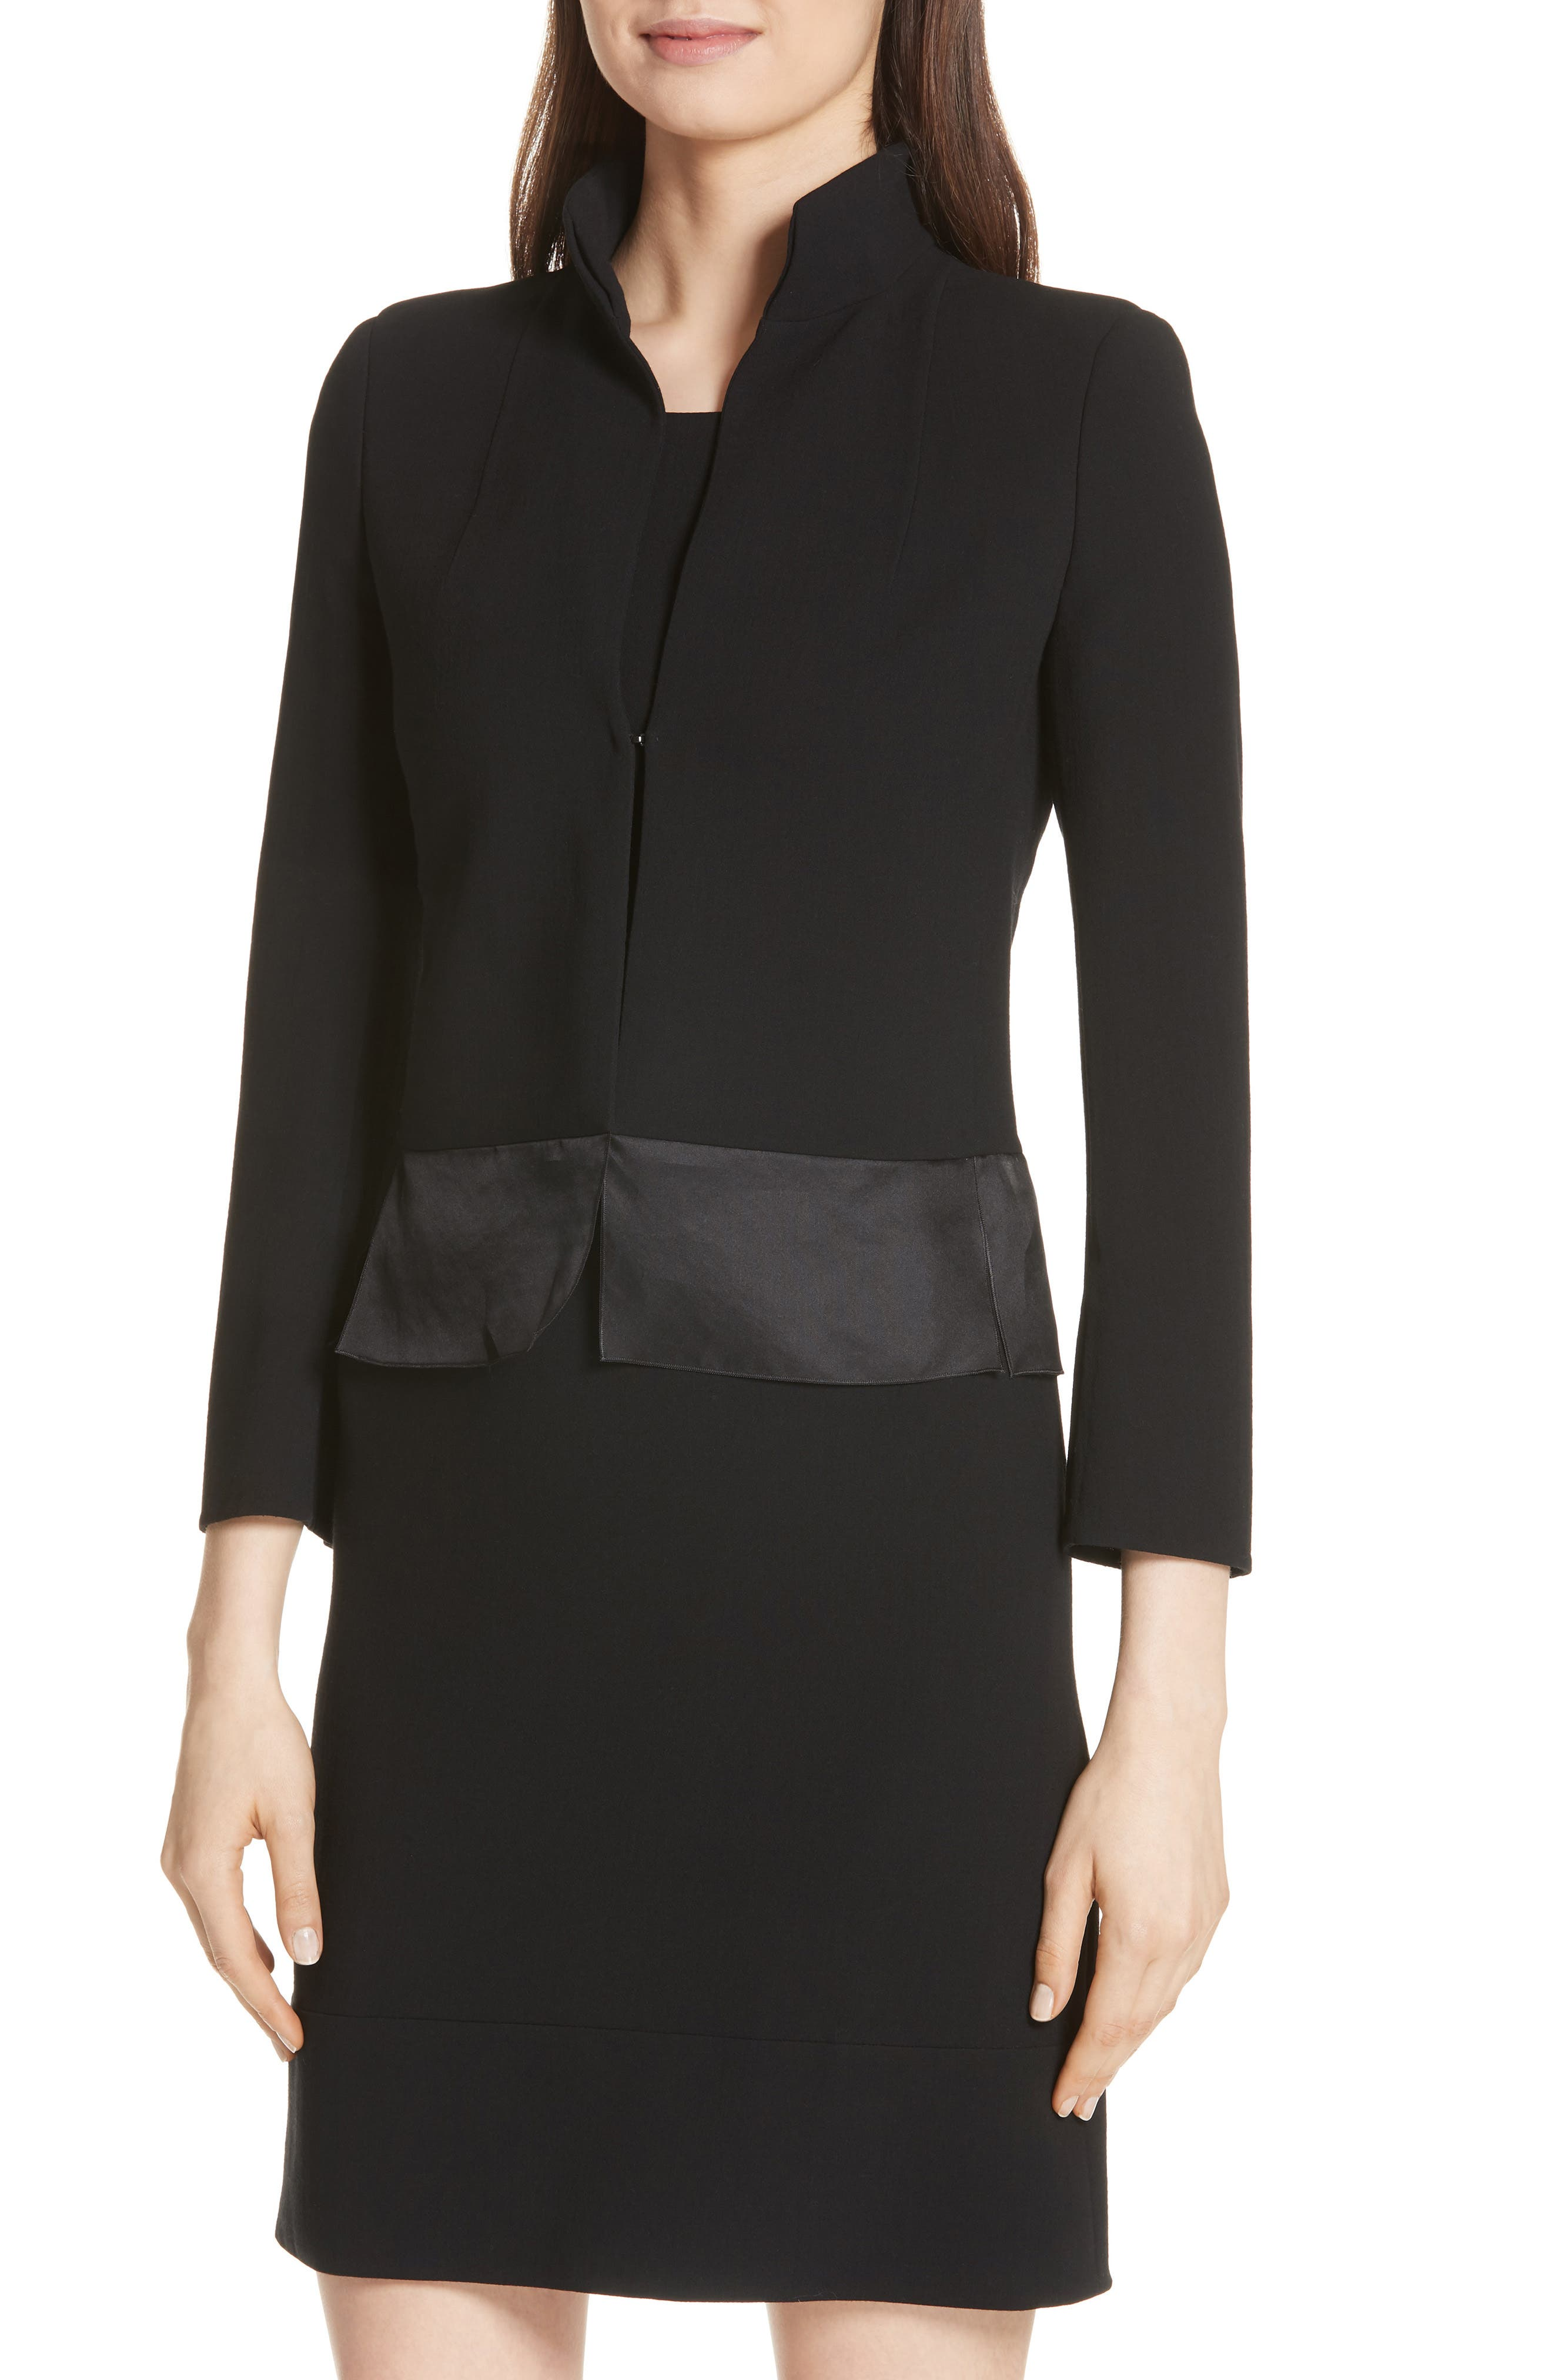 Ilke Double Face Wool Blend Jacket,                             Alternate thumbnail 4, color,                             BLACK